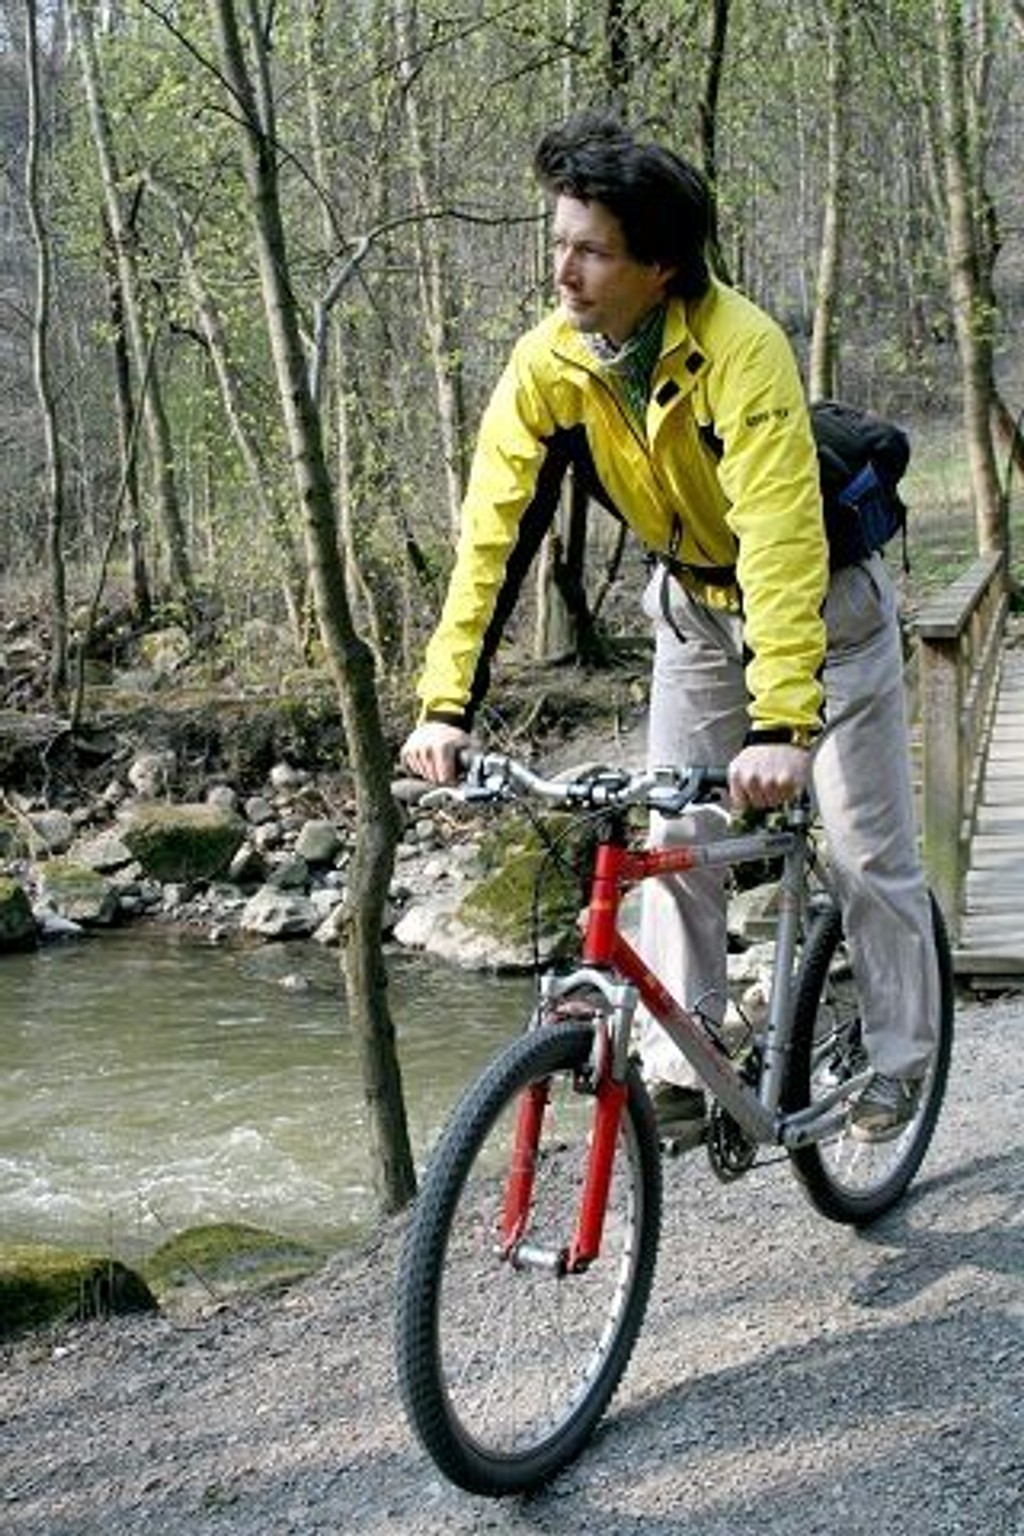 Forfatter og sykkelentusiast Øyvind Wold ferdes helst på to hjul gjennom Oslo. FOTO: HEGE BJØRNSDATTER BRAATEN